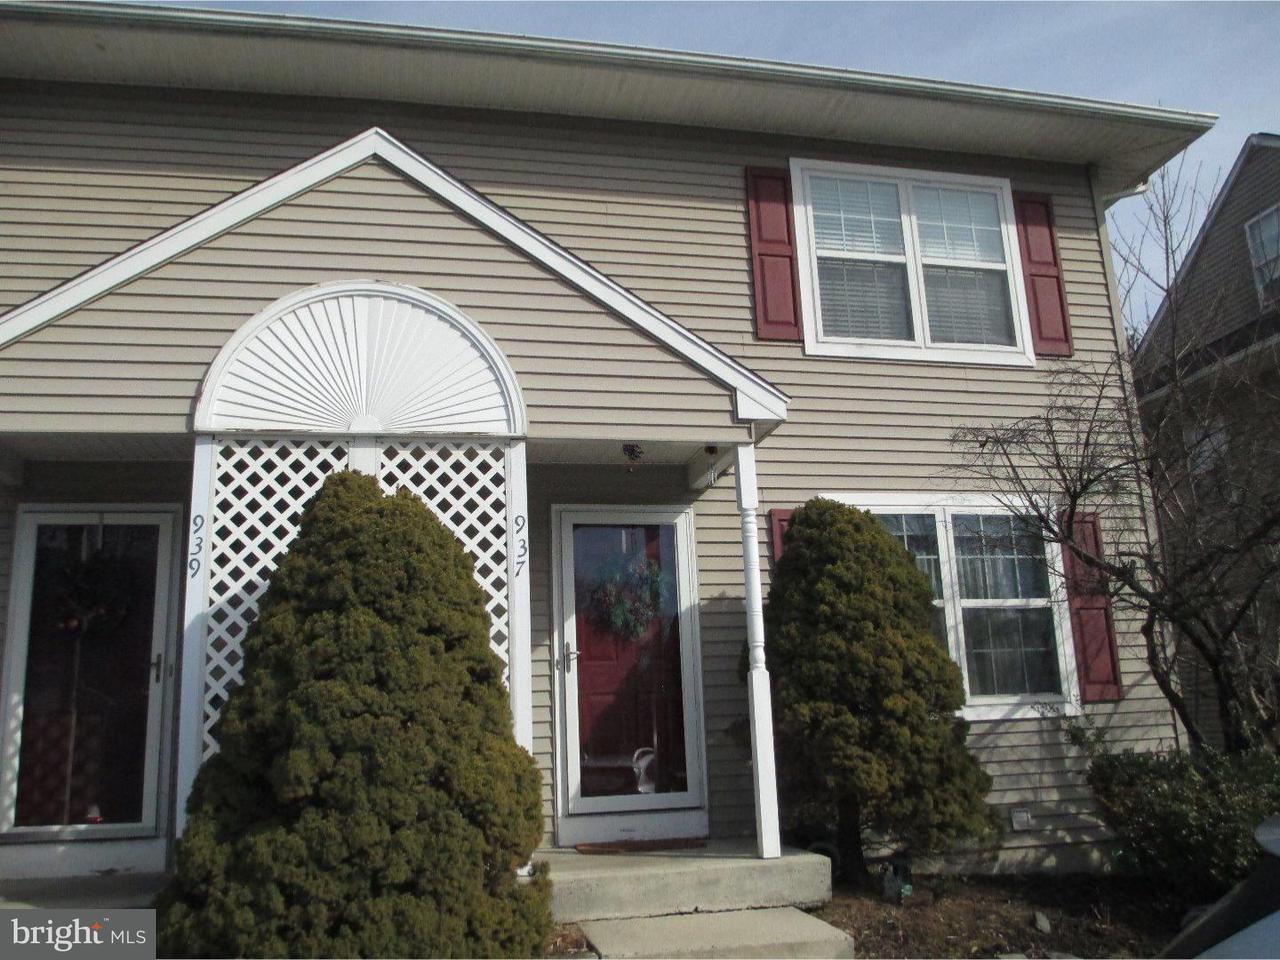 Casa unifamiliar adosada (Townhouse) por un Alquiler en 937 WOODLAWN Avenue Phoenixville, Pennsylvania 19460 Estados Unidos